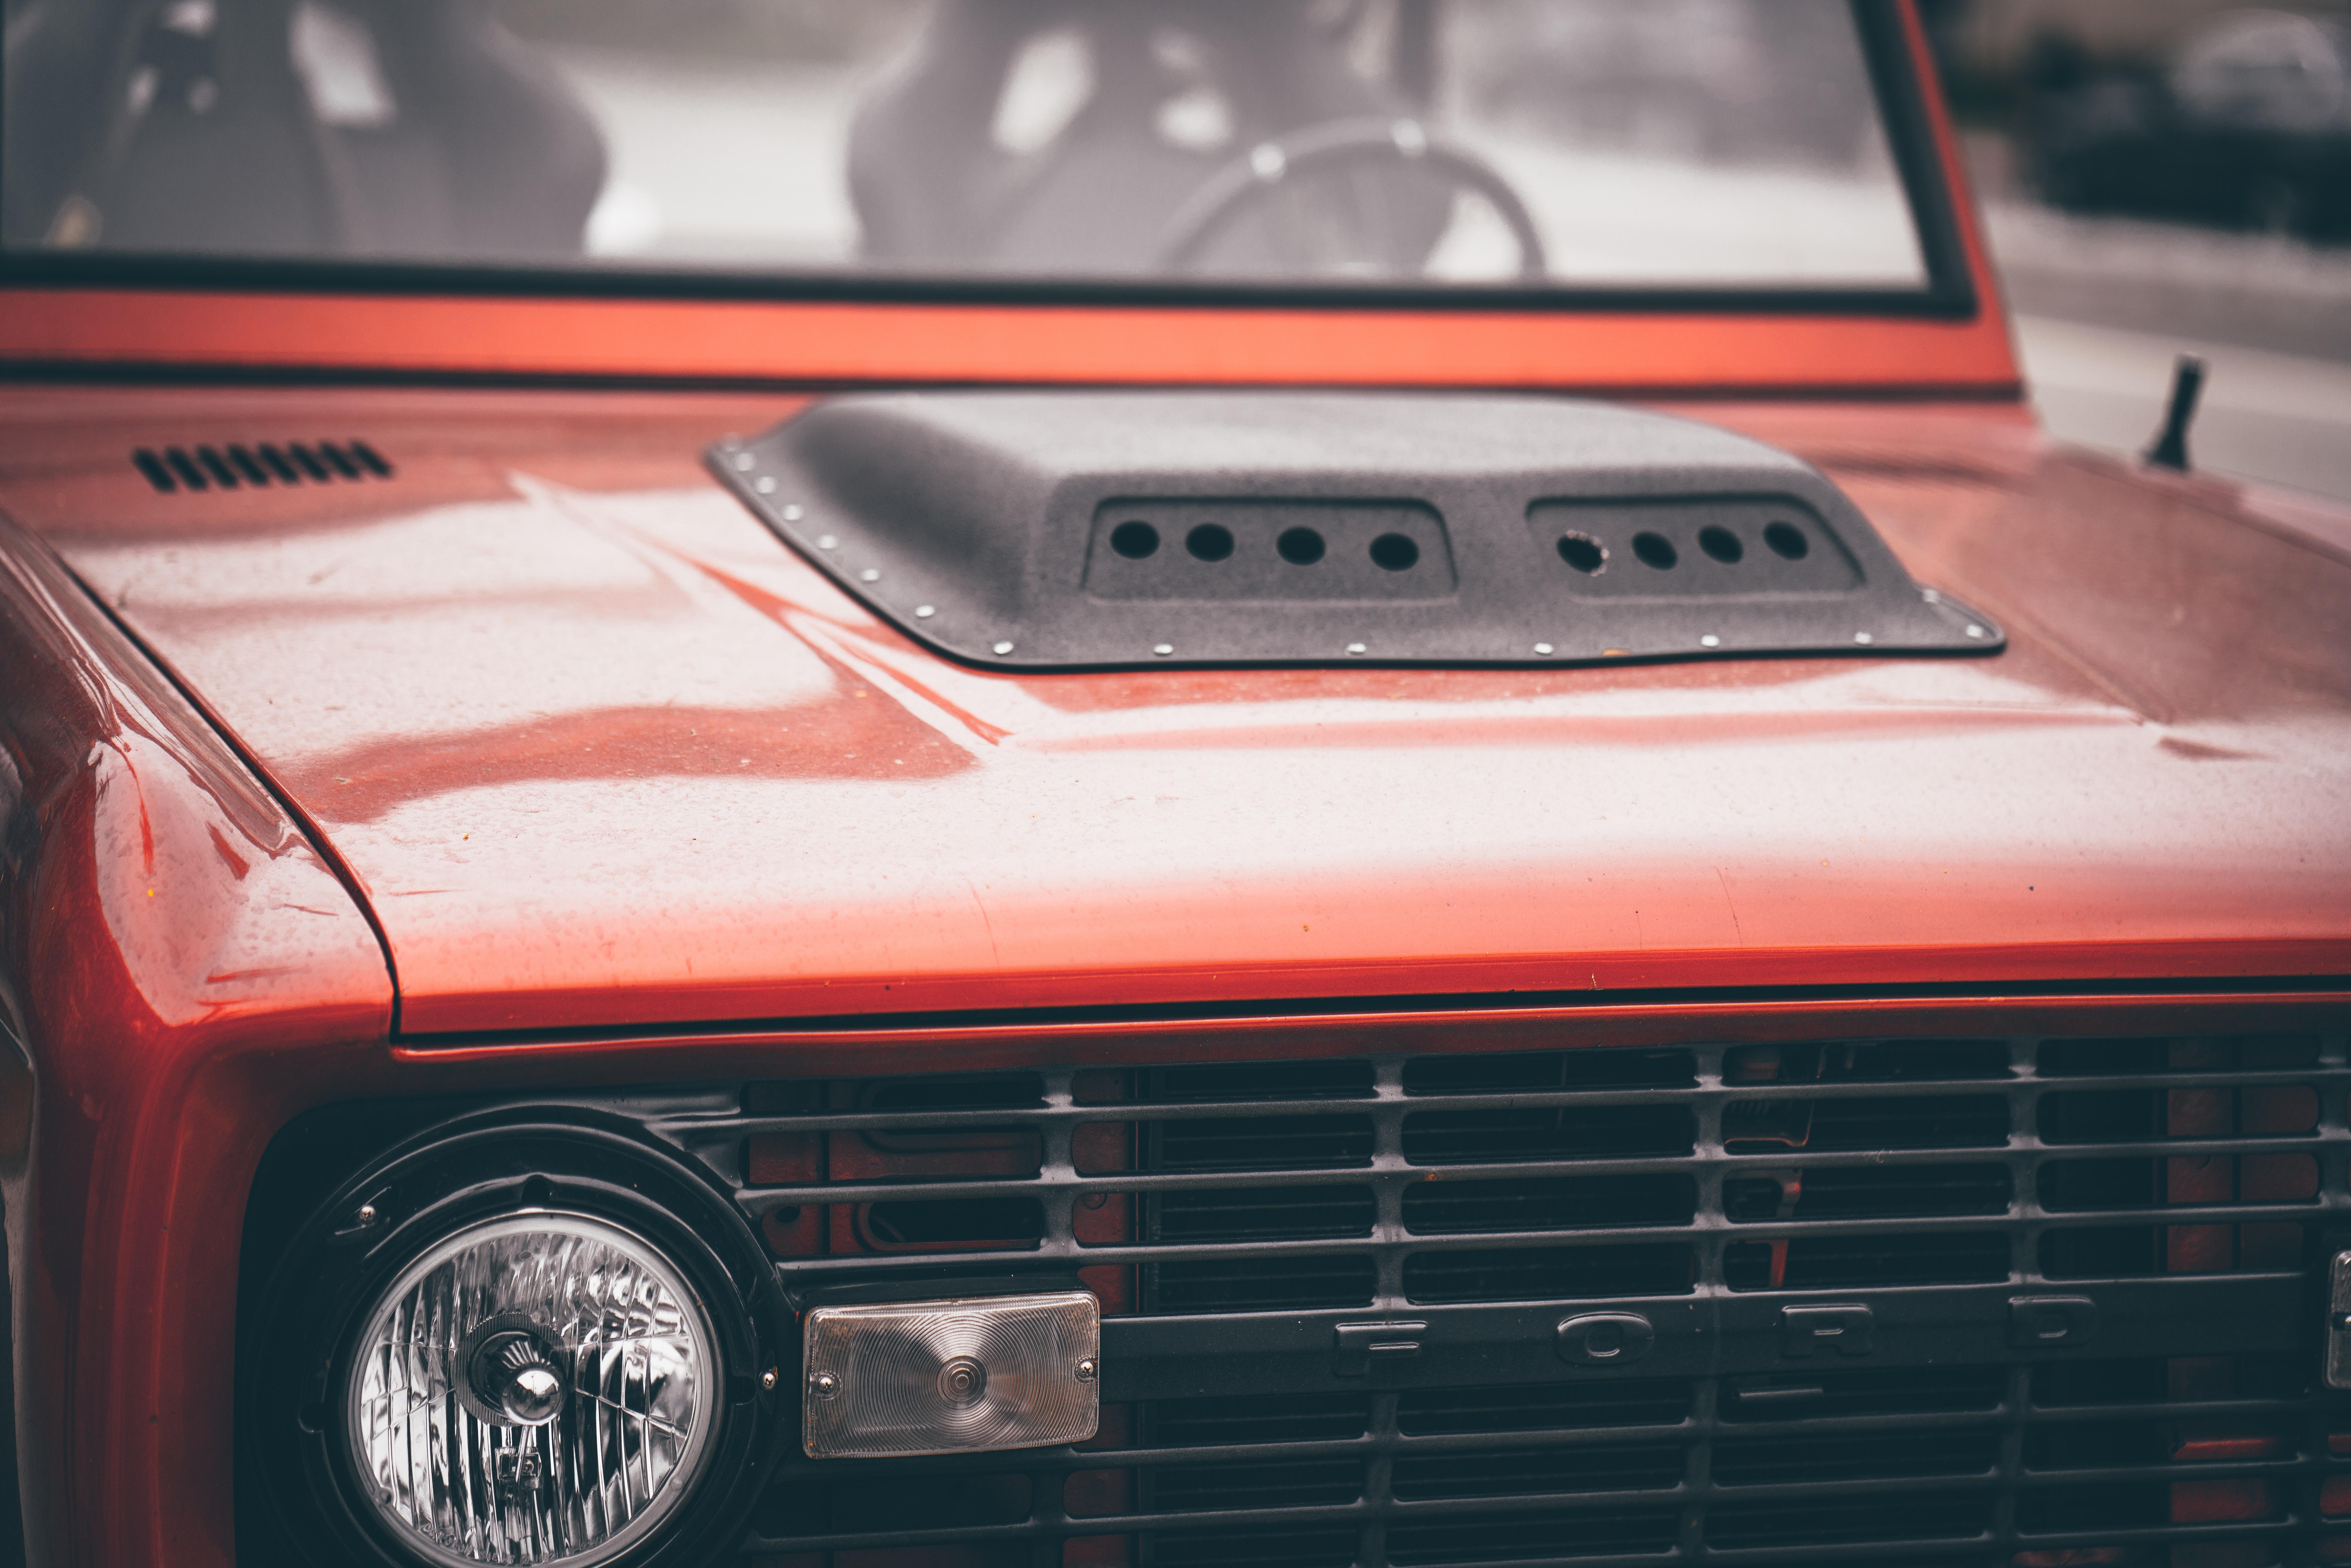 A red Ford car in Santa Monica